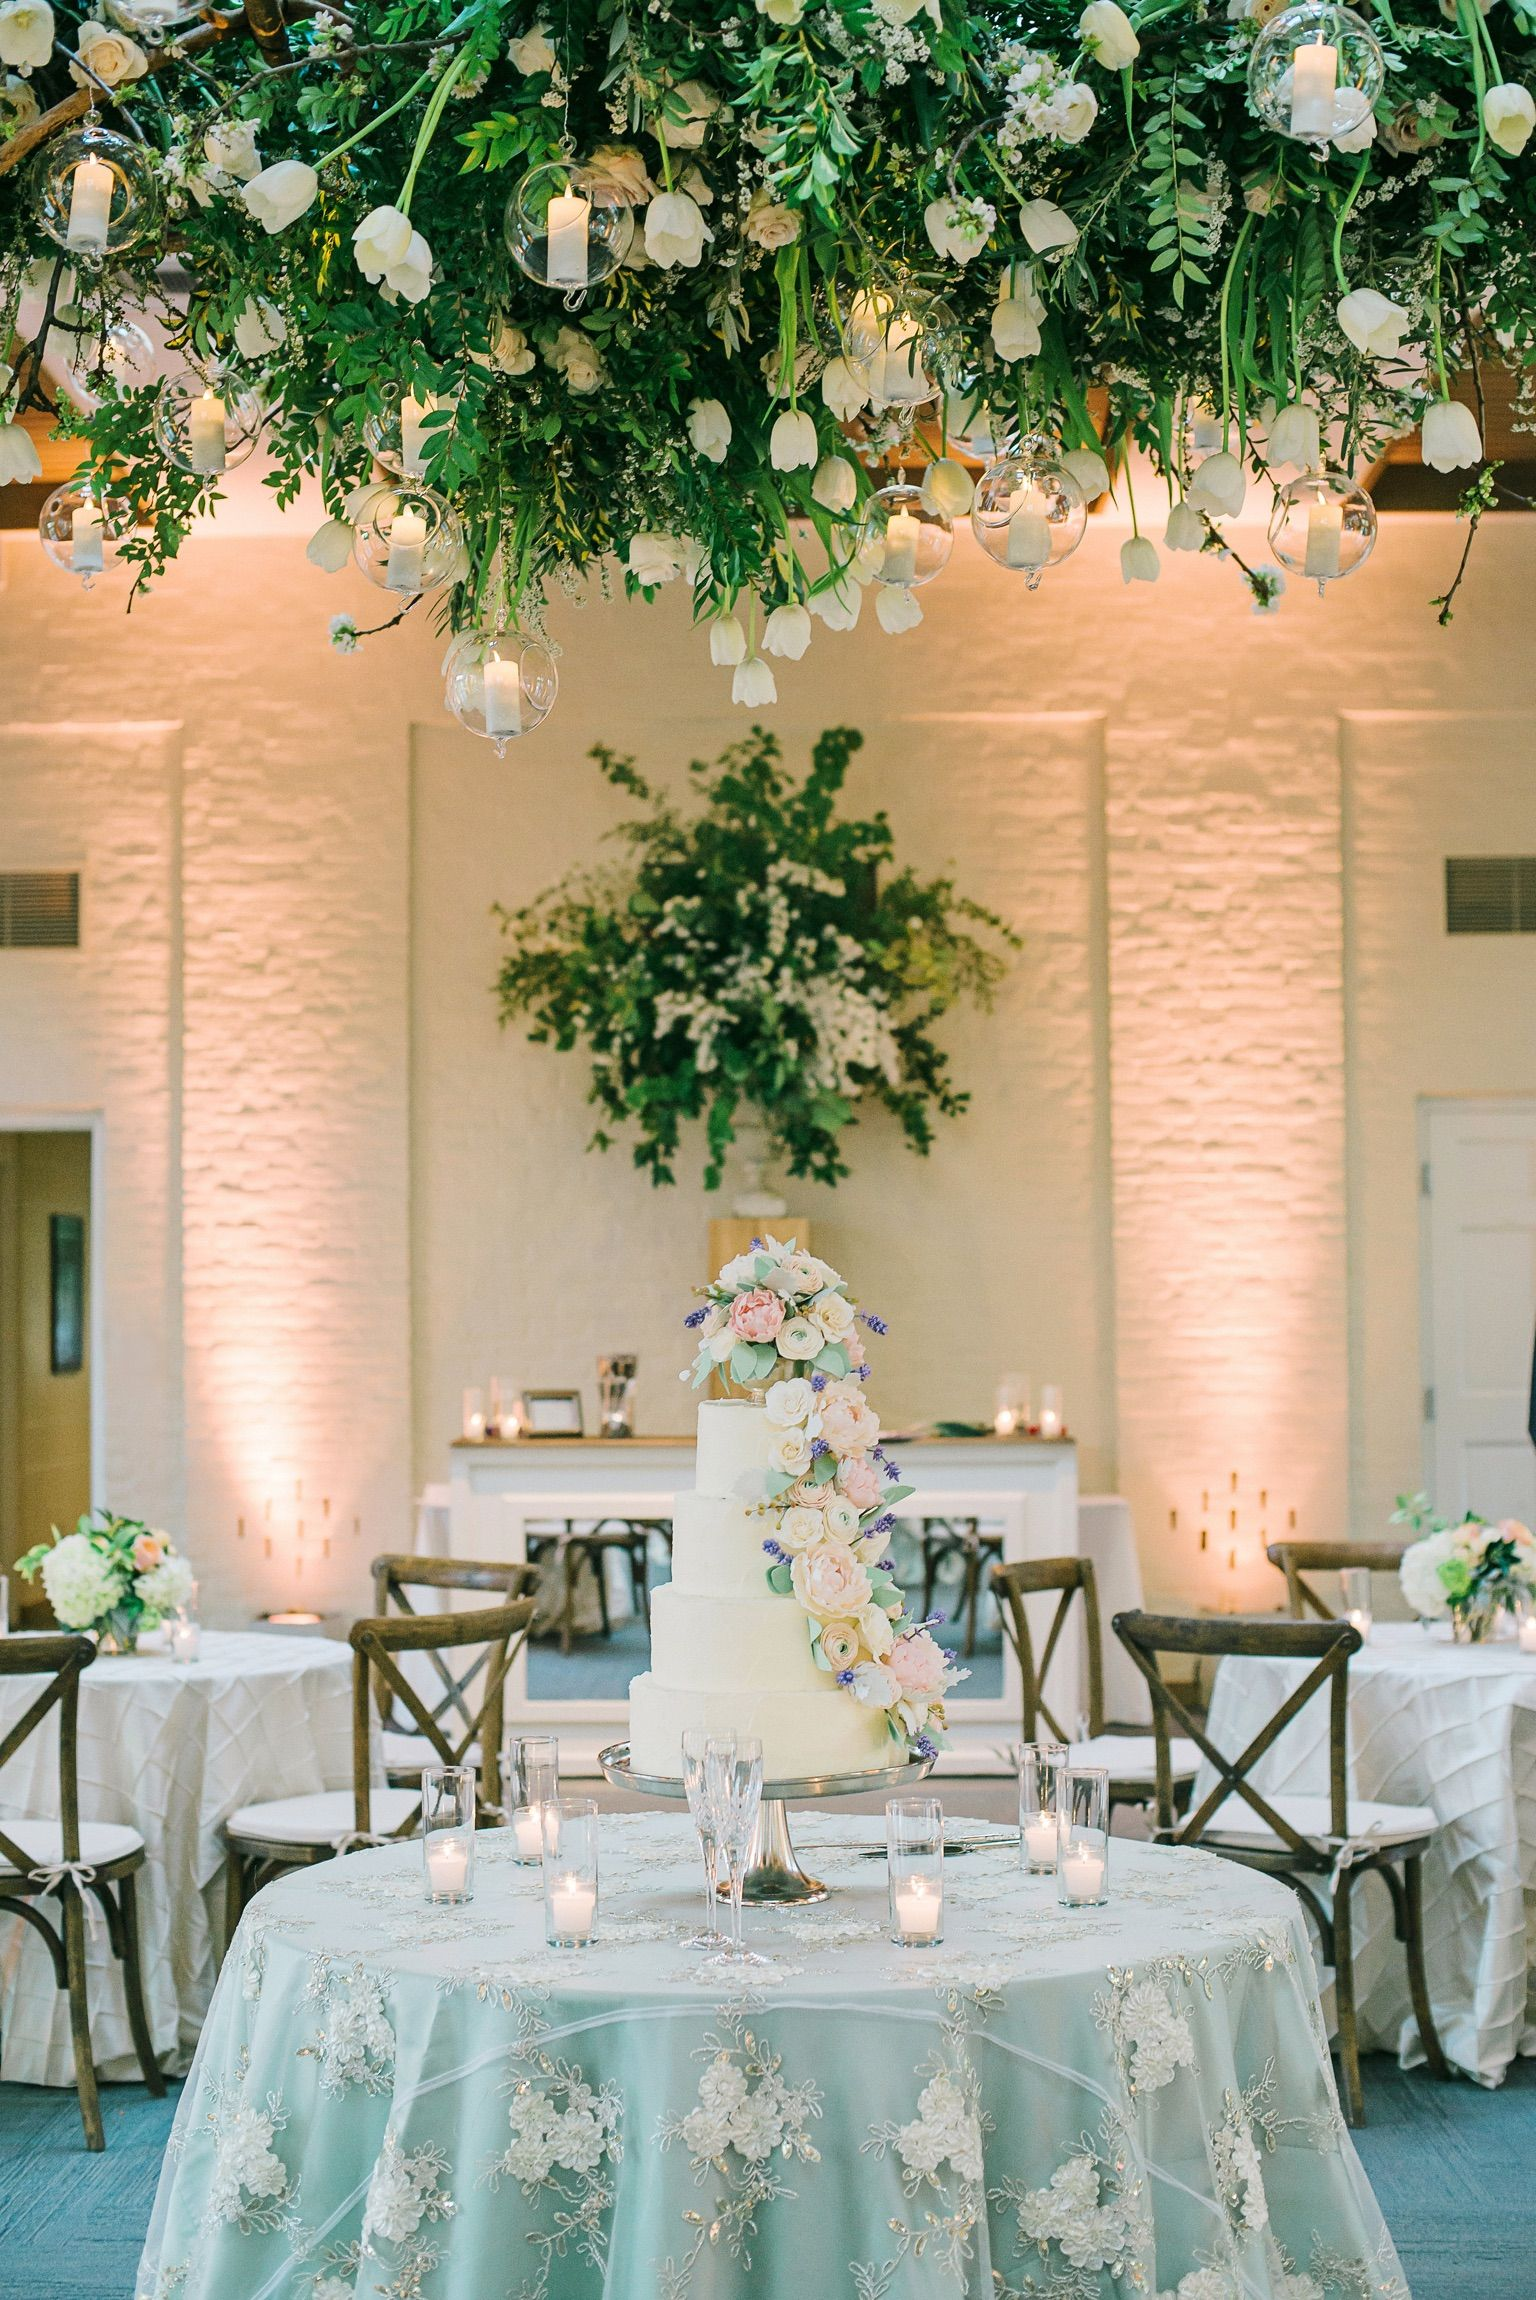 Ivory White Green Charming Enchanted Wedding Reception